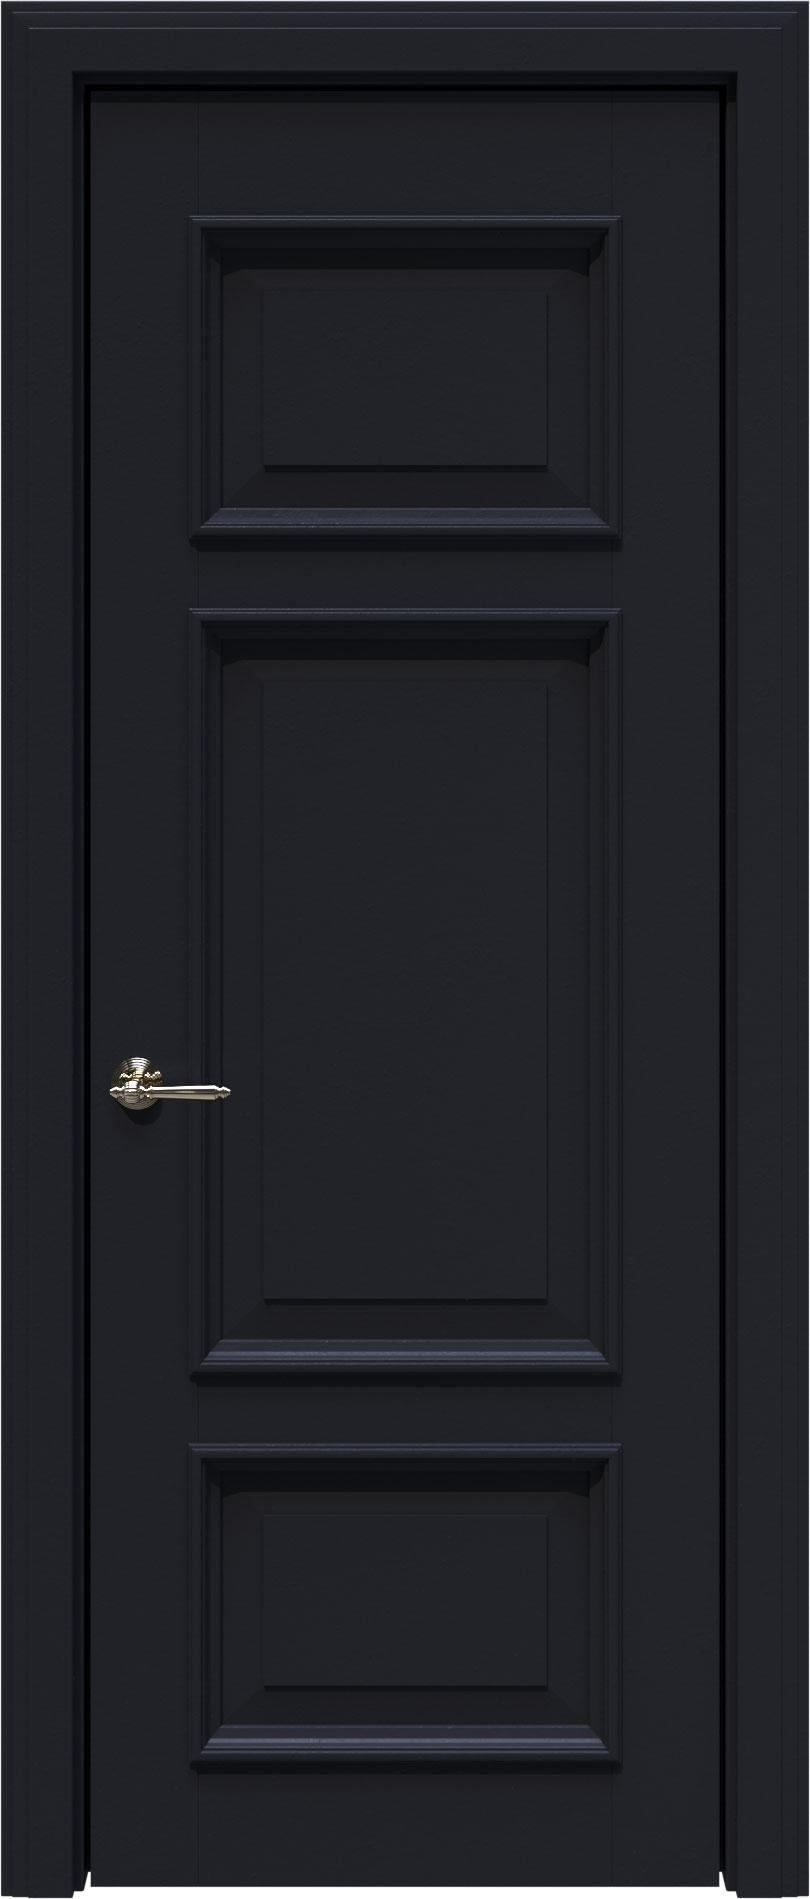 Siena LUX цвет - Черная эмаль (RAL 9004) Без стекла (ДГ)